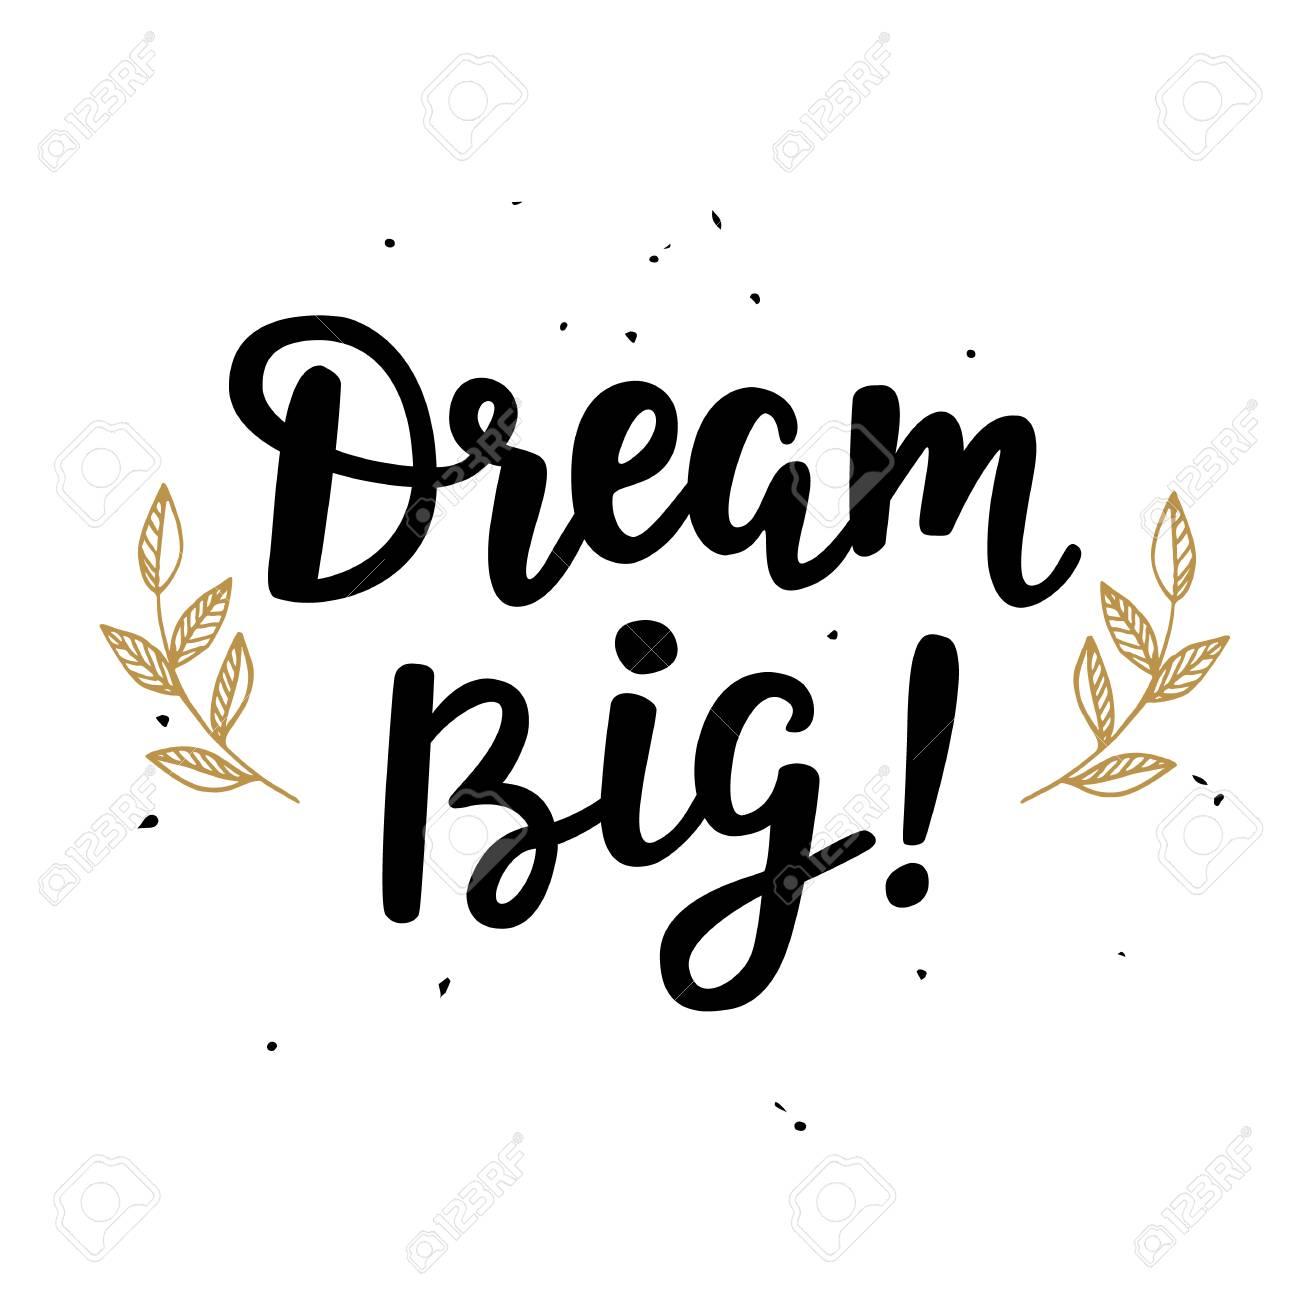 How to Dream Big